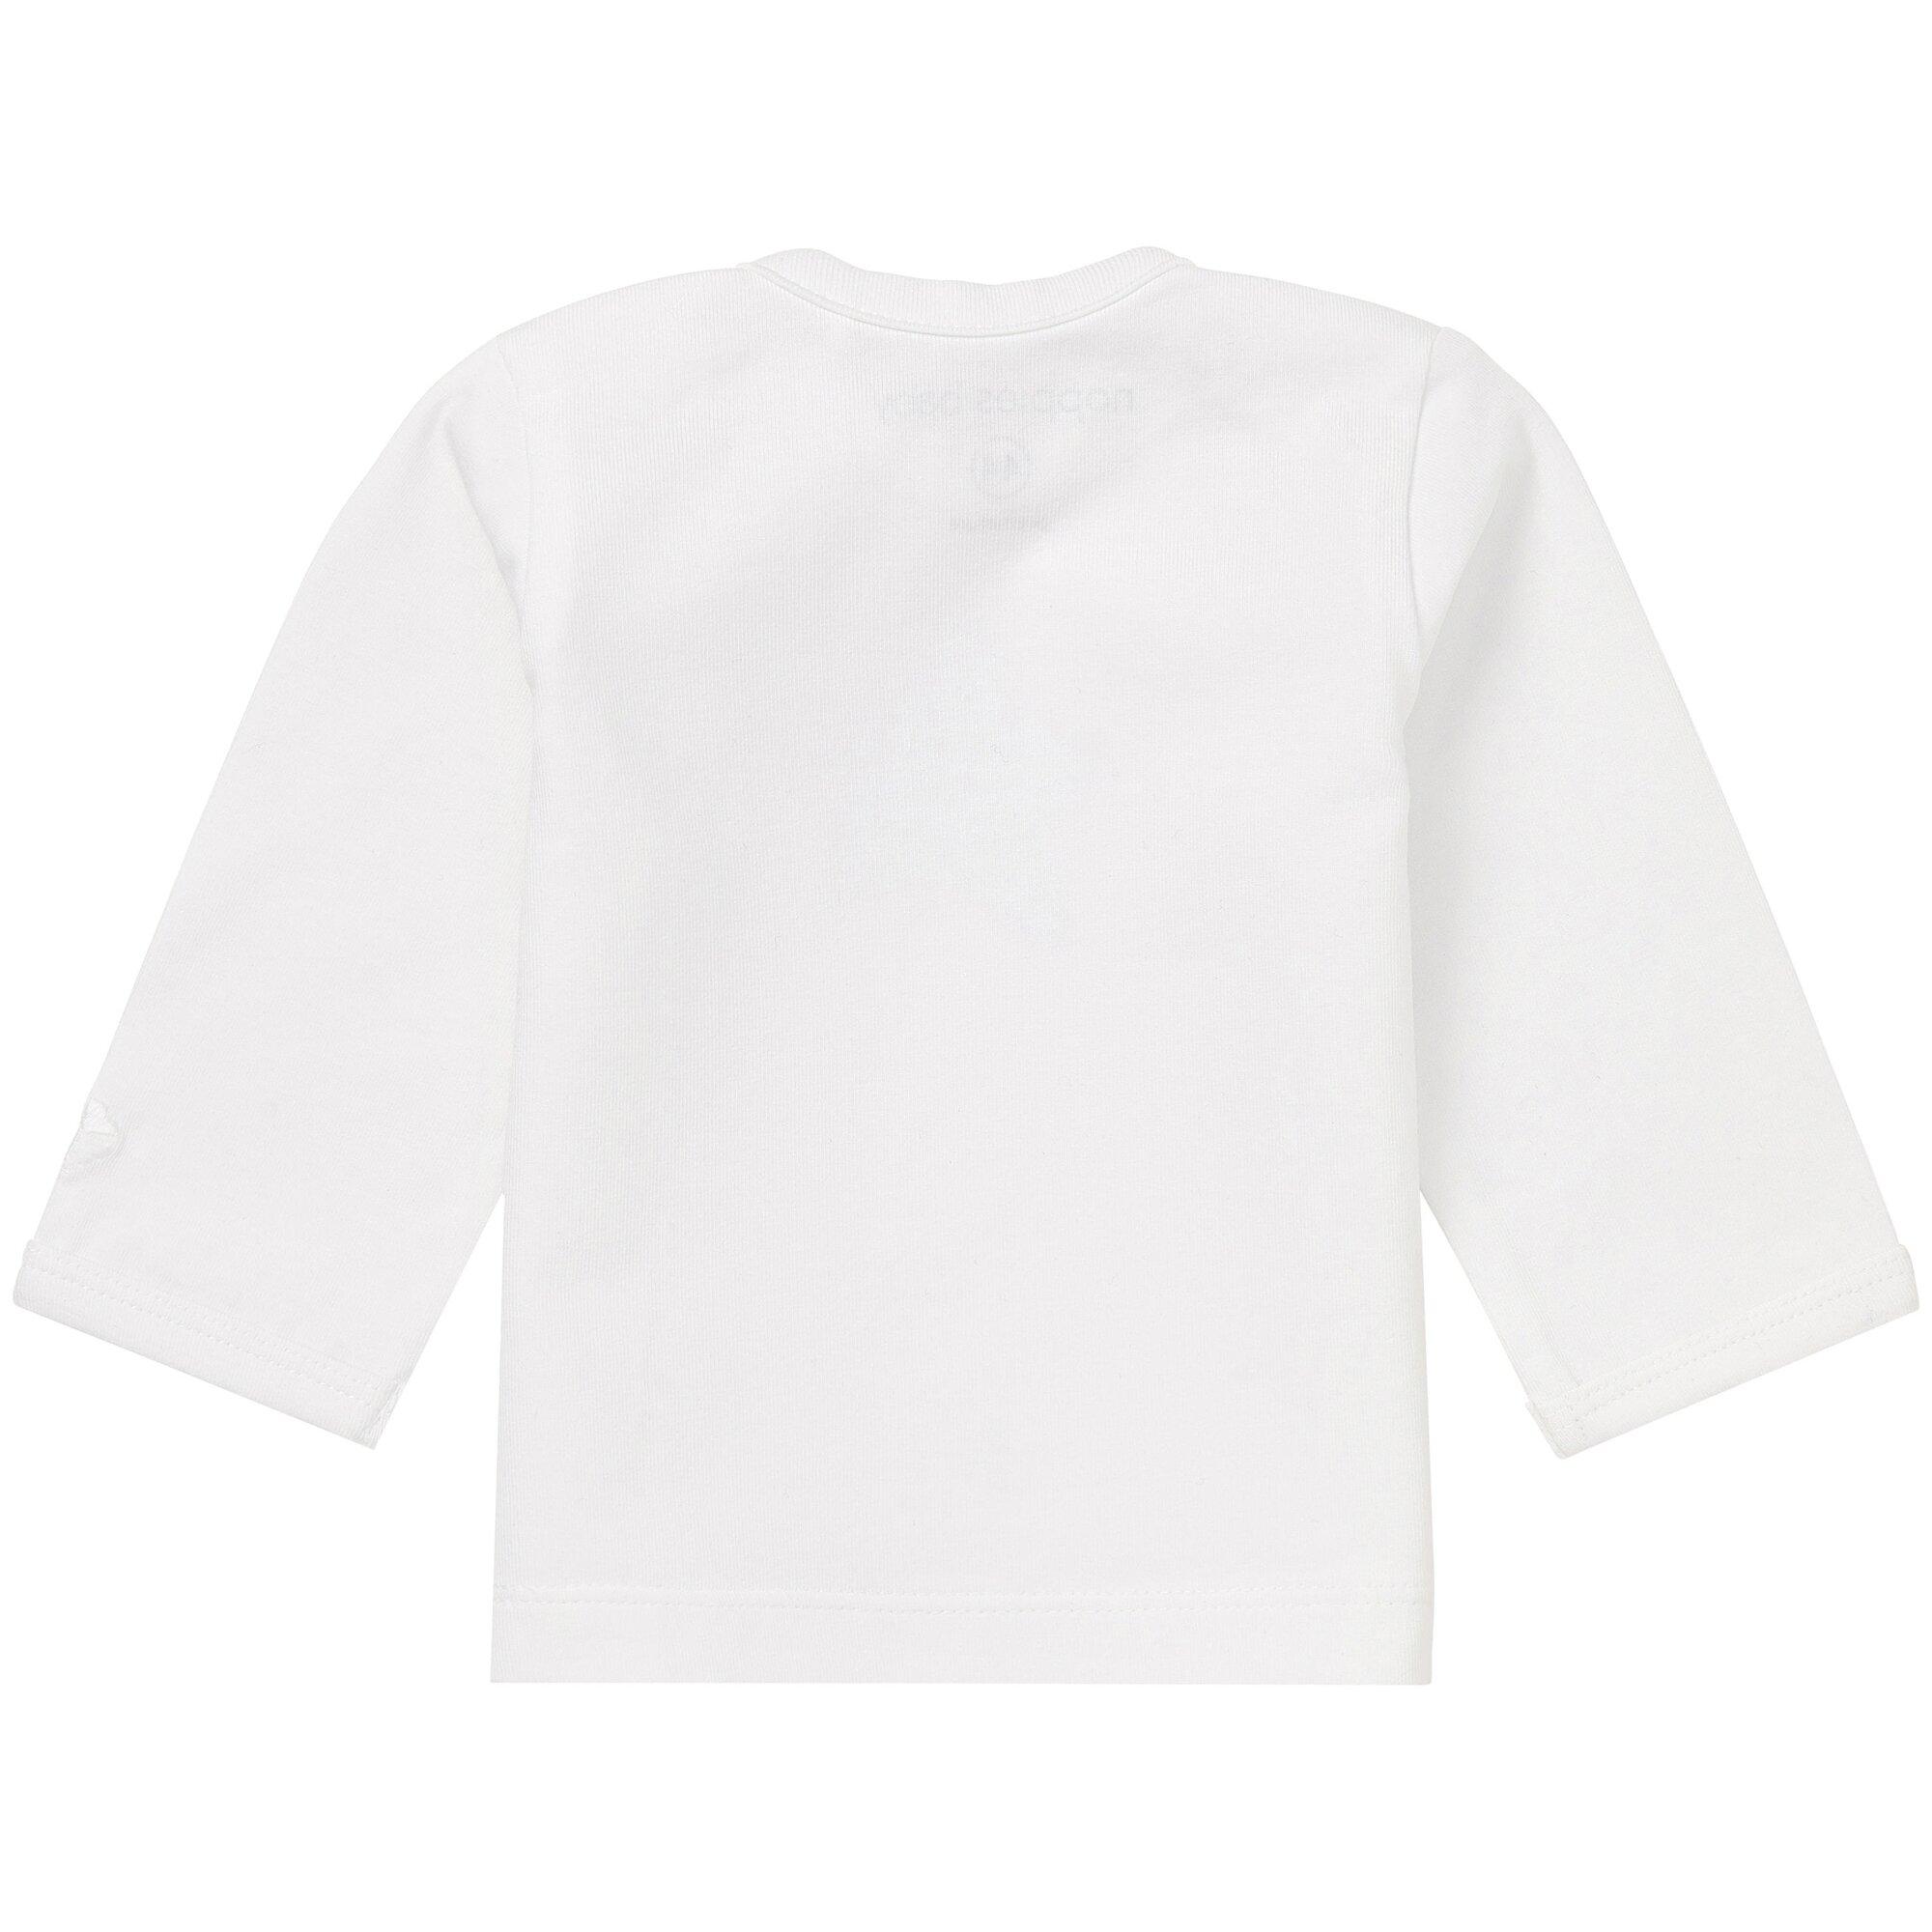 noppies-langarmshirt-melanie-weiss-44-50-56-62-68-74